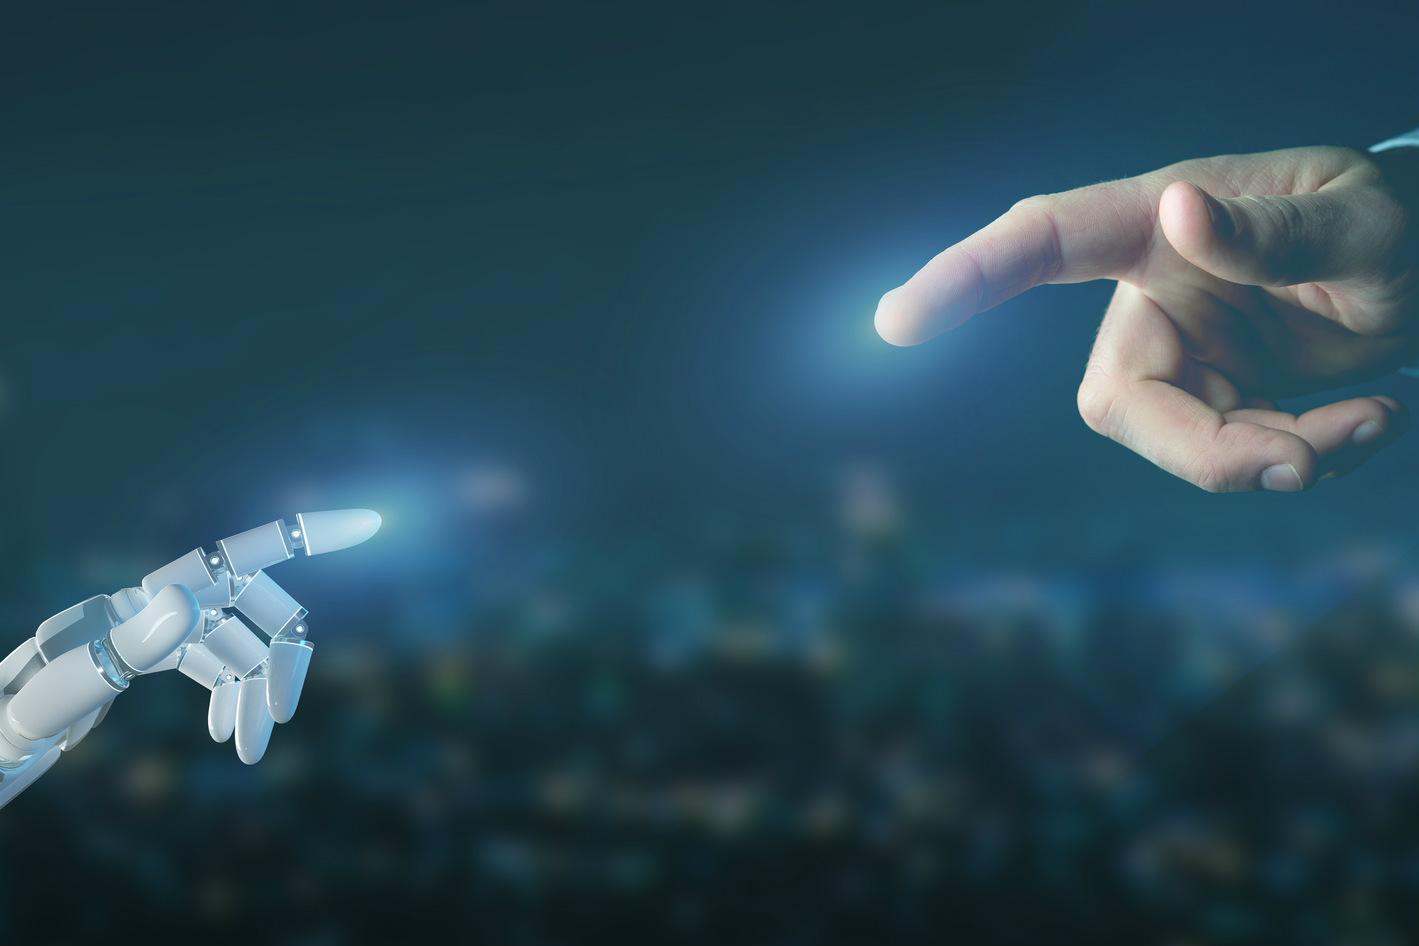 Robot Uomo algoritmo